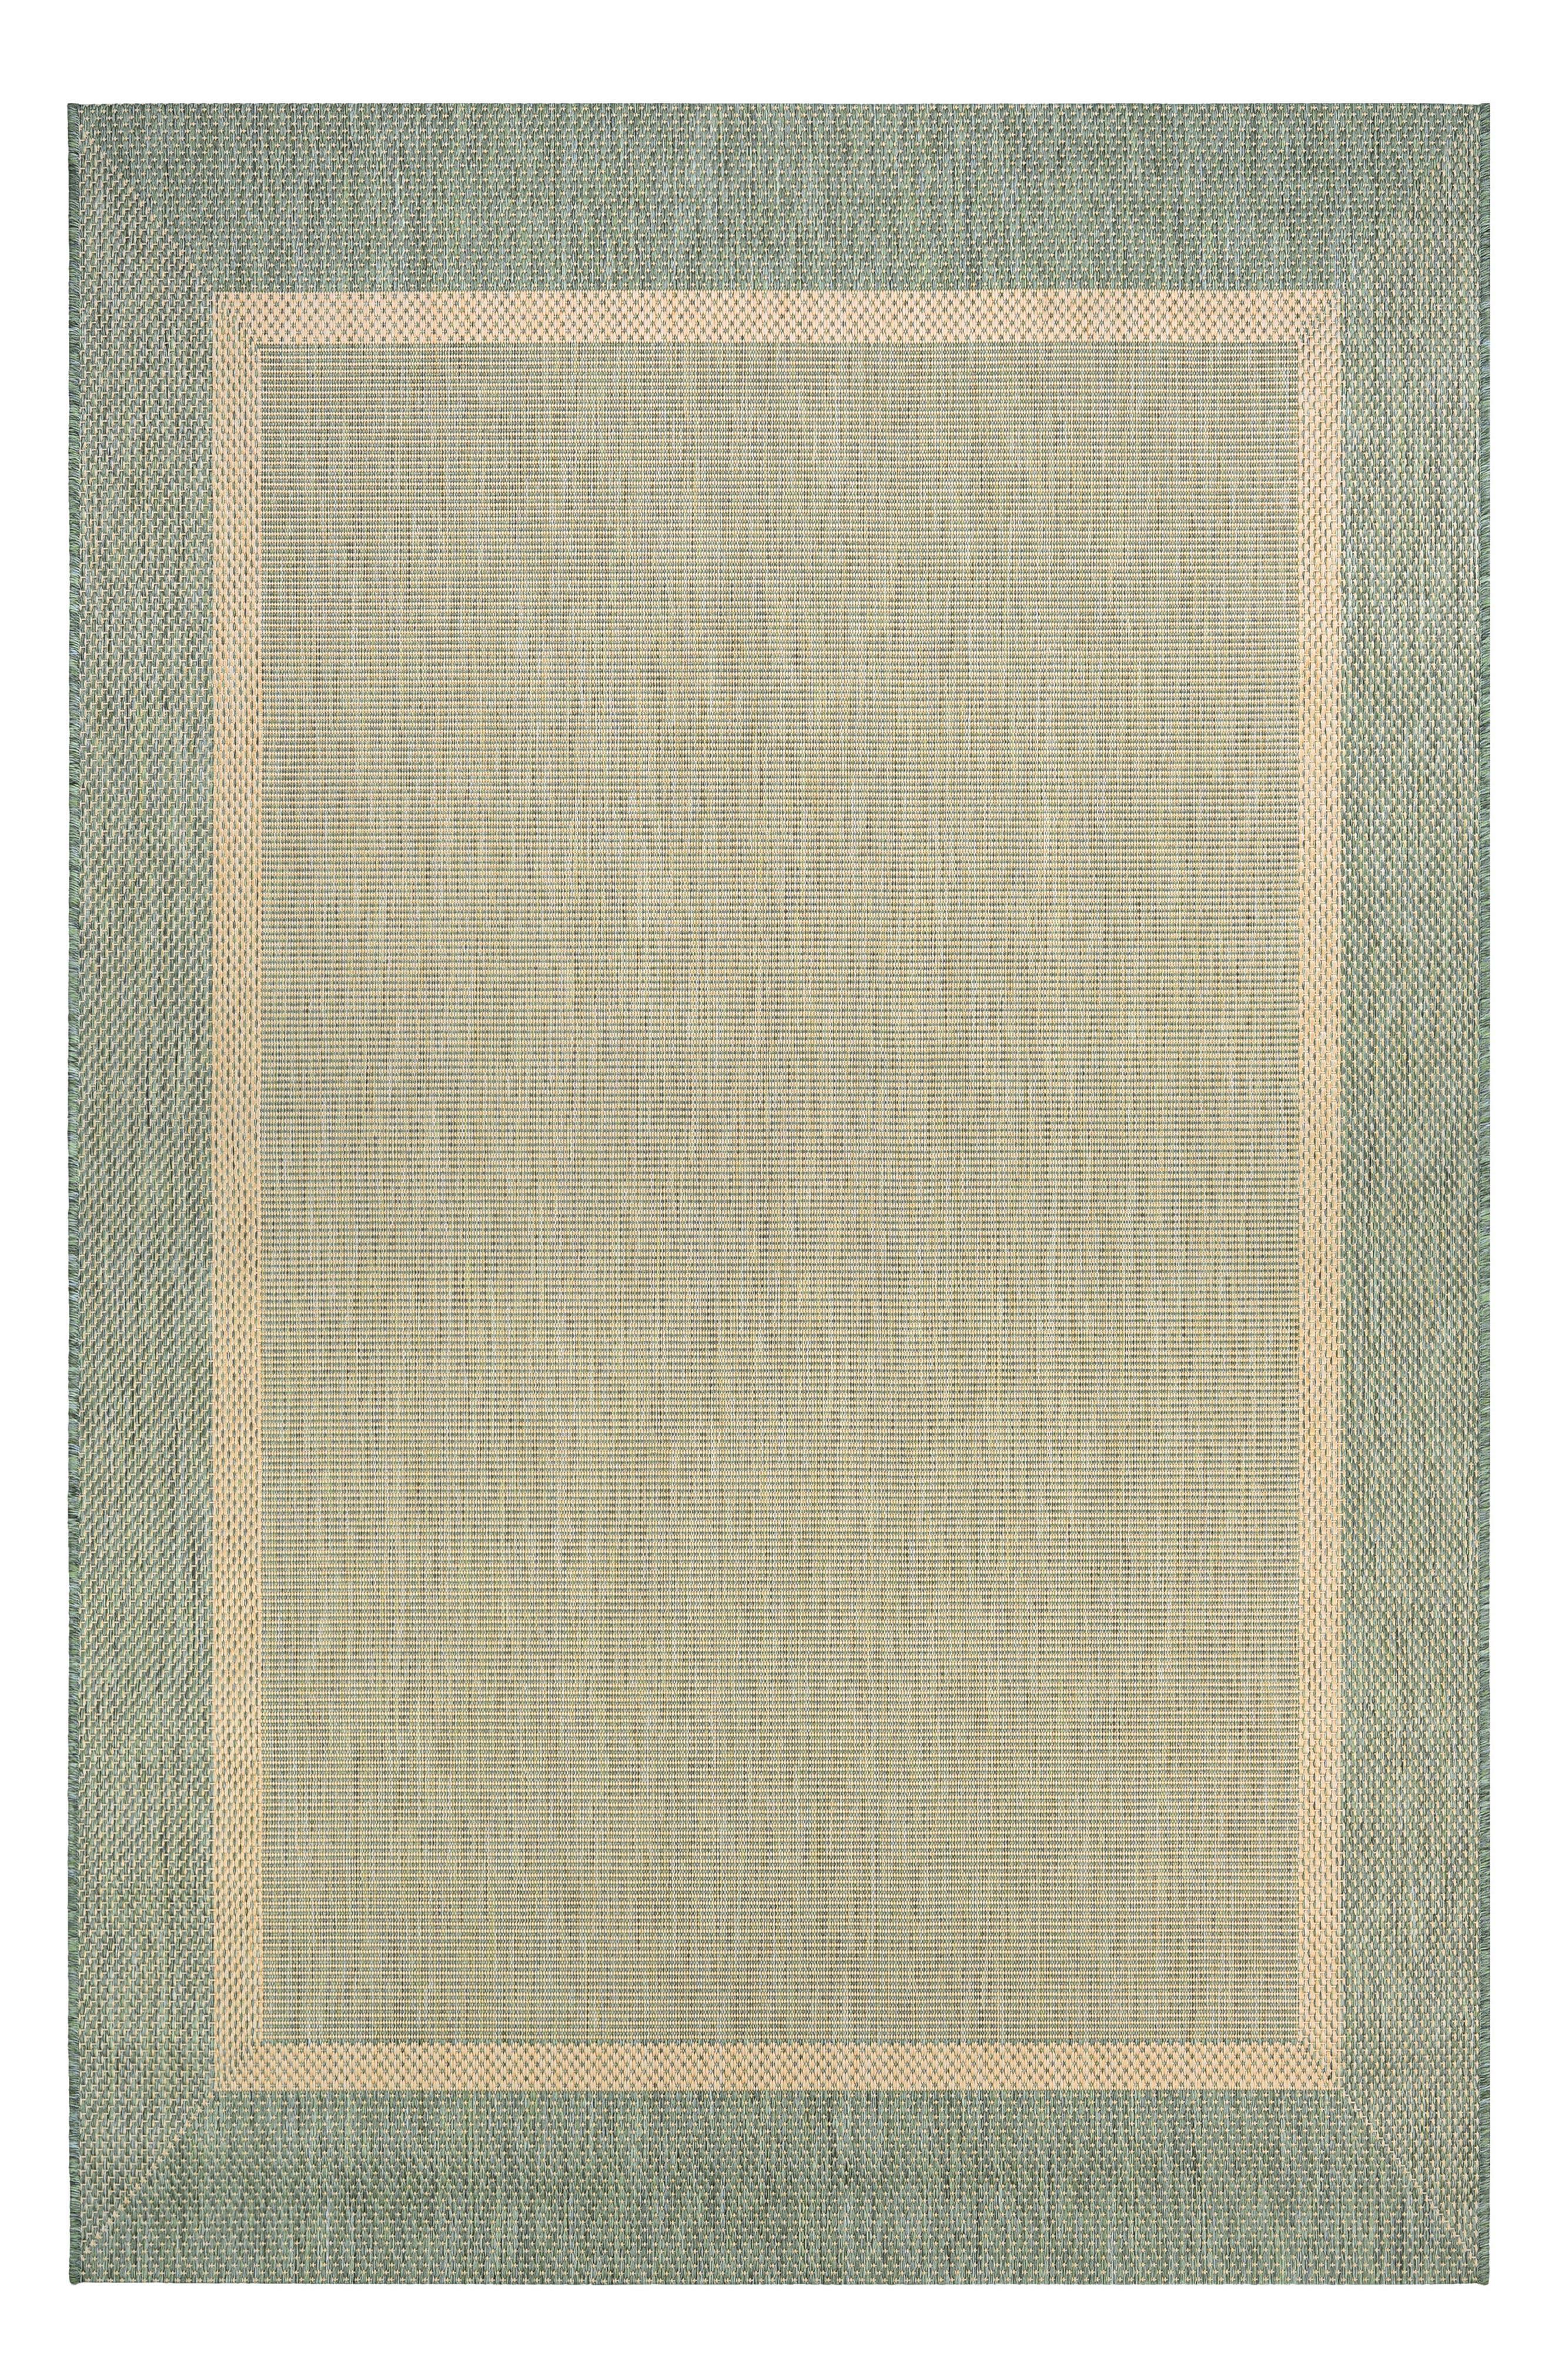 Stria Texture Indoor/Outdoor Rug,                             Main thumbnail 1, color,                             NATURAL/ GREEN